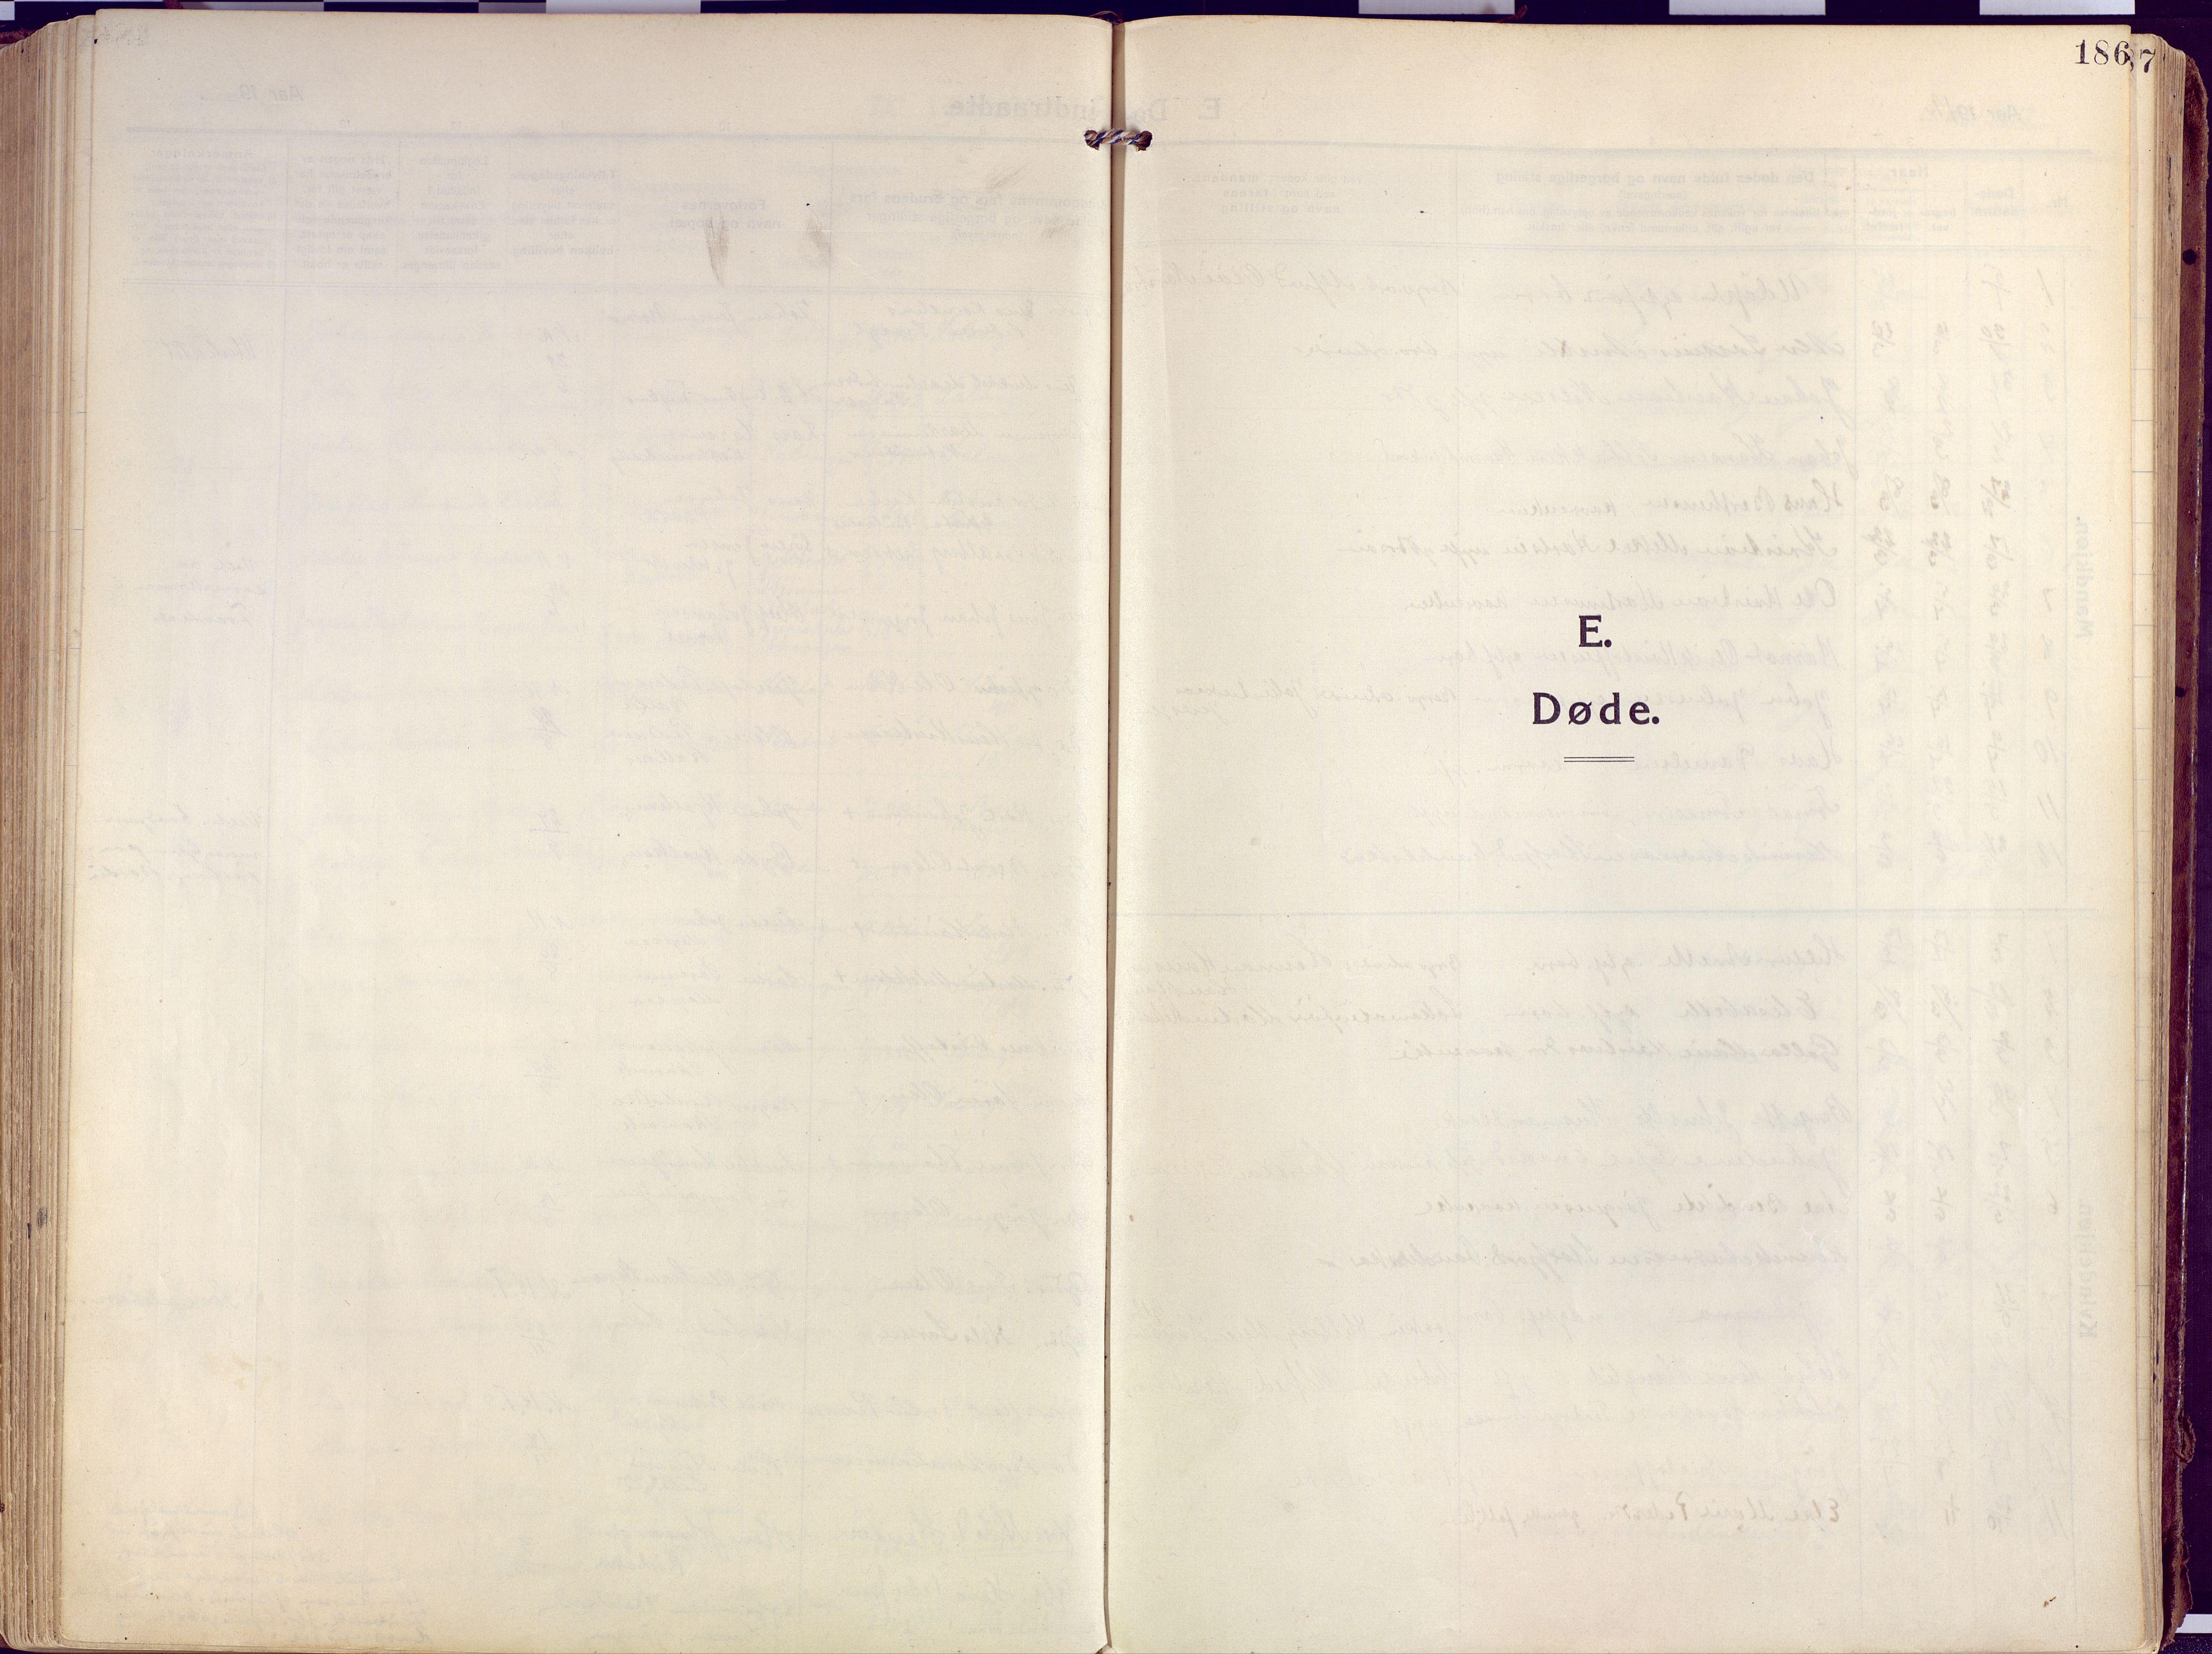 SATØ, Salangen sokneprestembete, Ministerialbok nr. 4, 1912-1927, s. 186